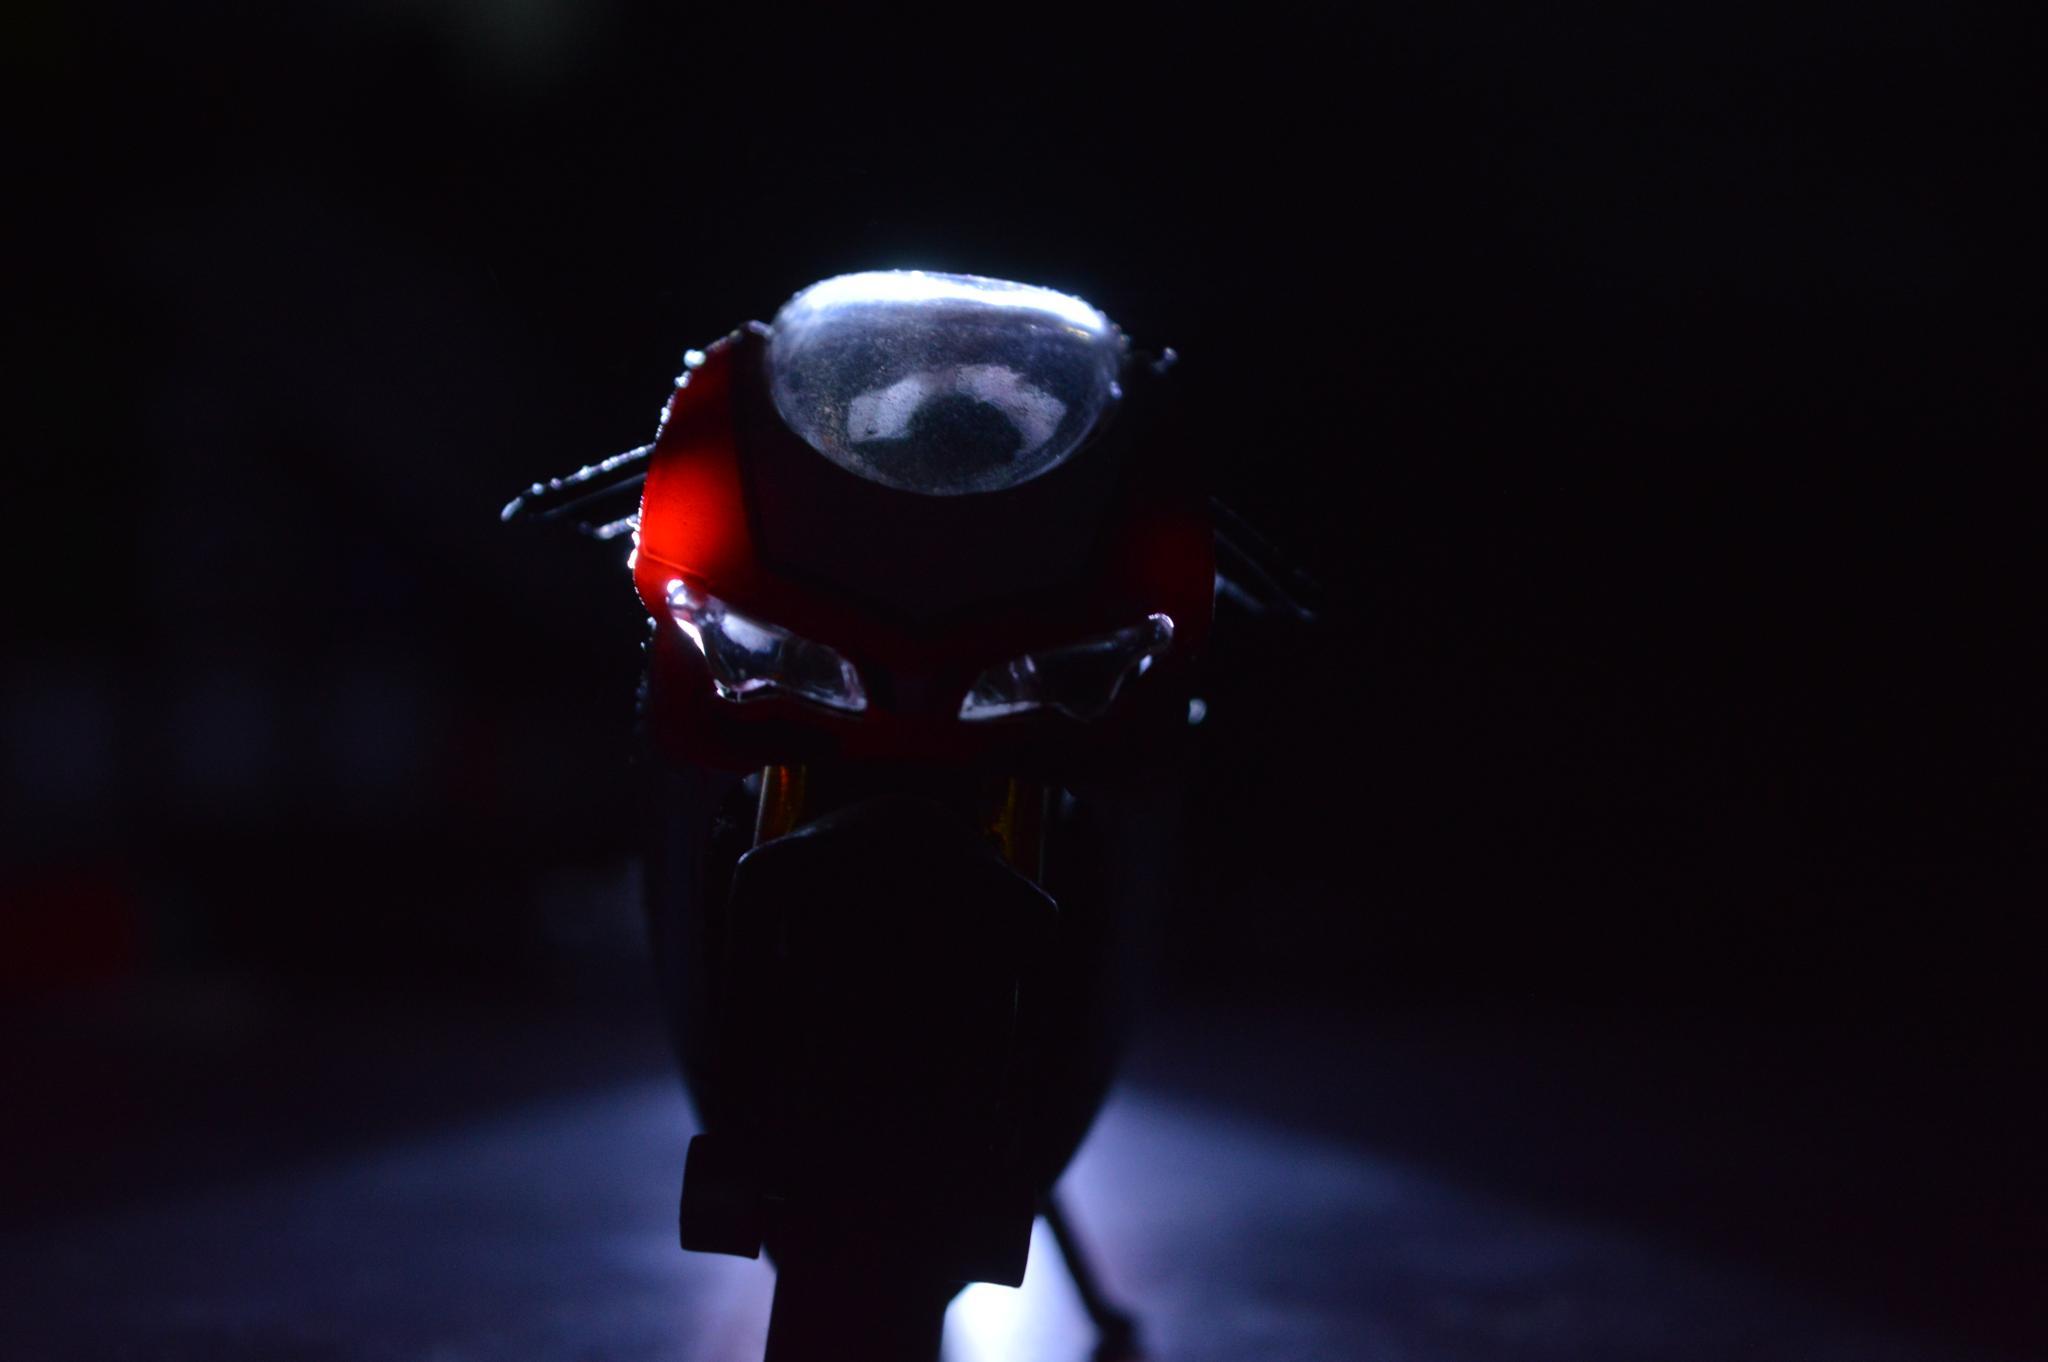 The Ducati  by namanmohanty